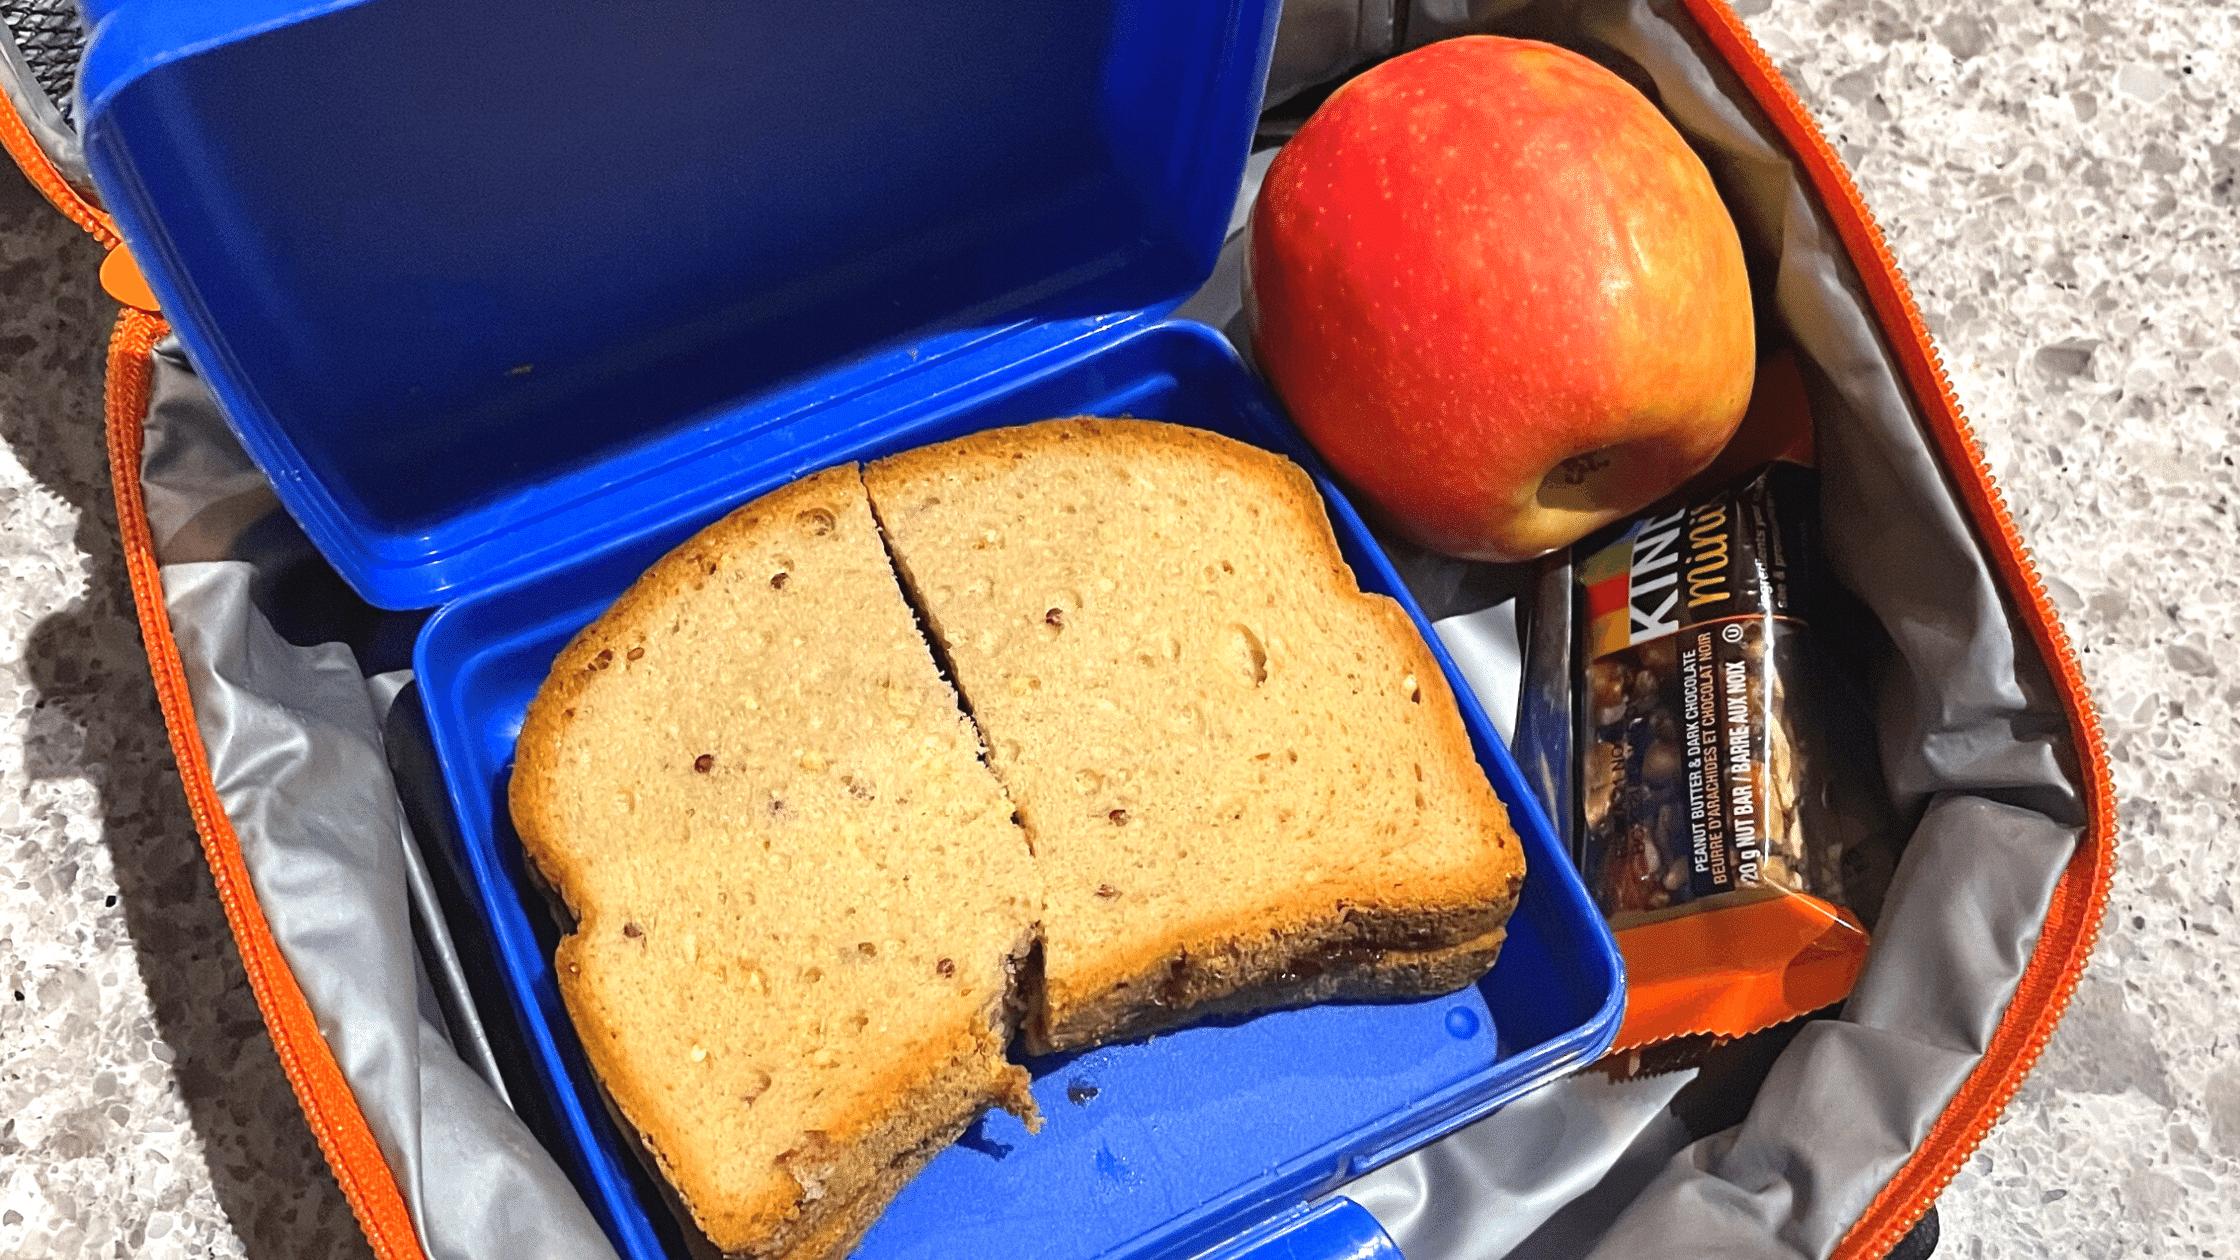 uneaten school lunch